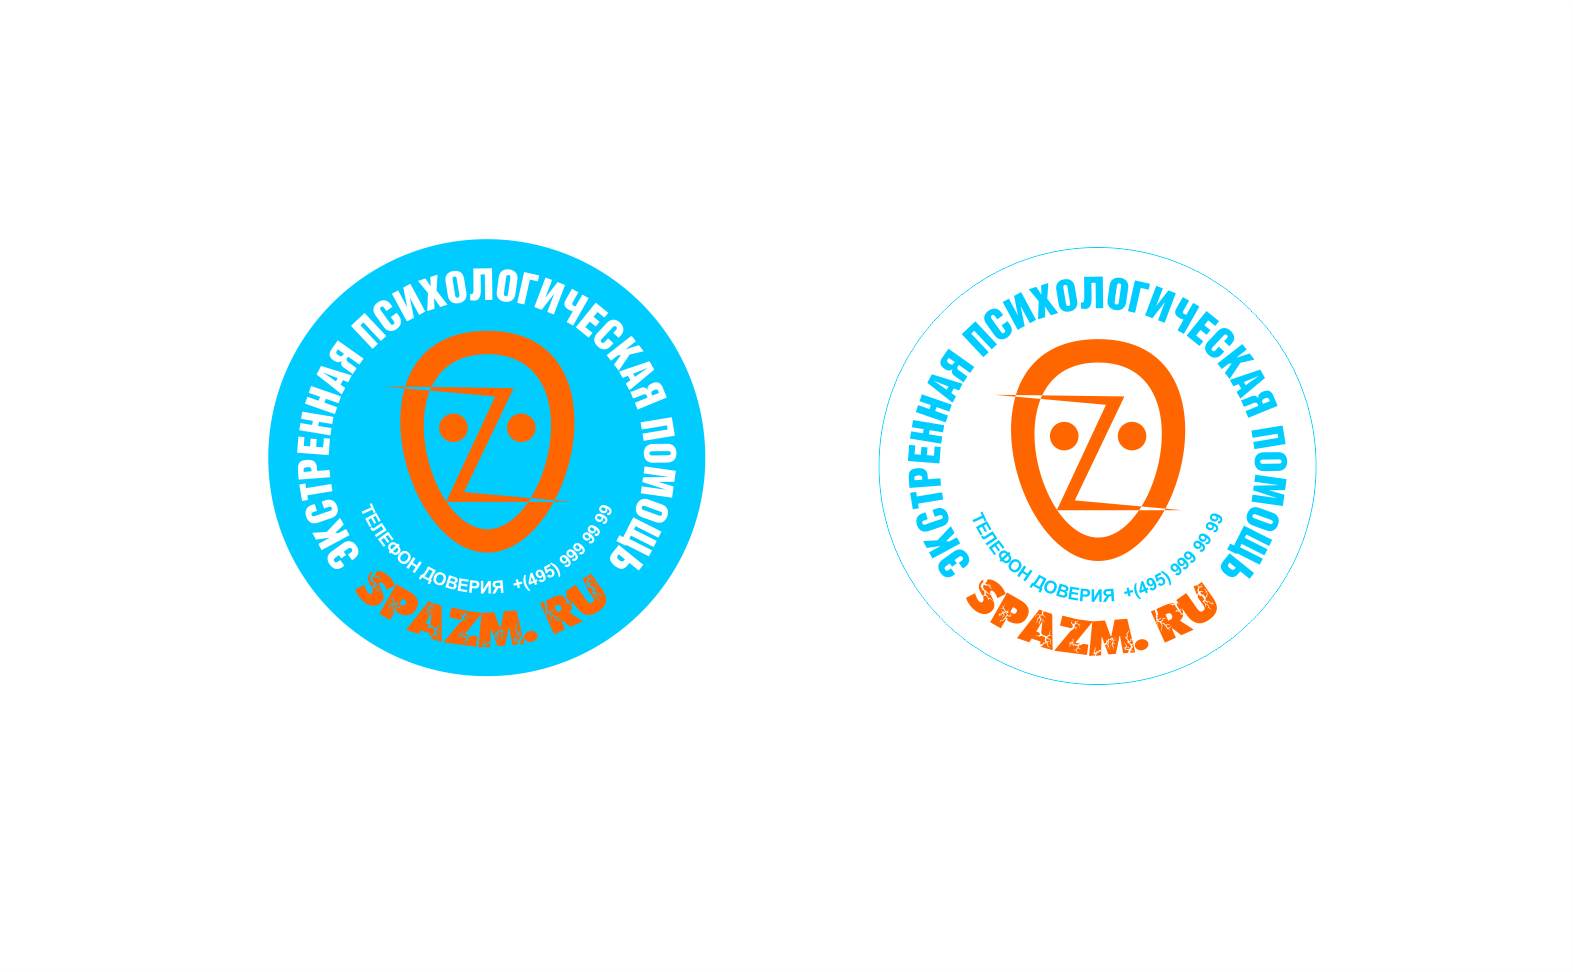 Логотип для сайта психологического телефона доверия фото f_82757b70d3630ffa.png